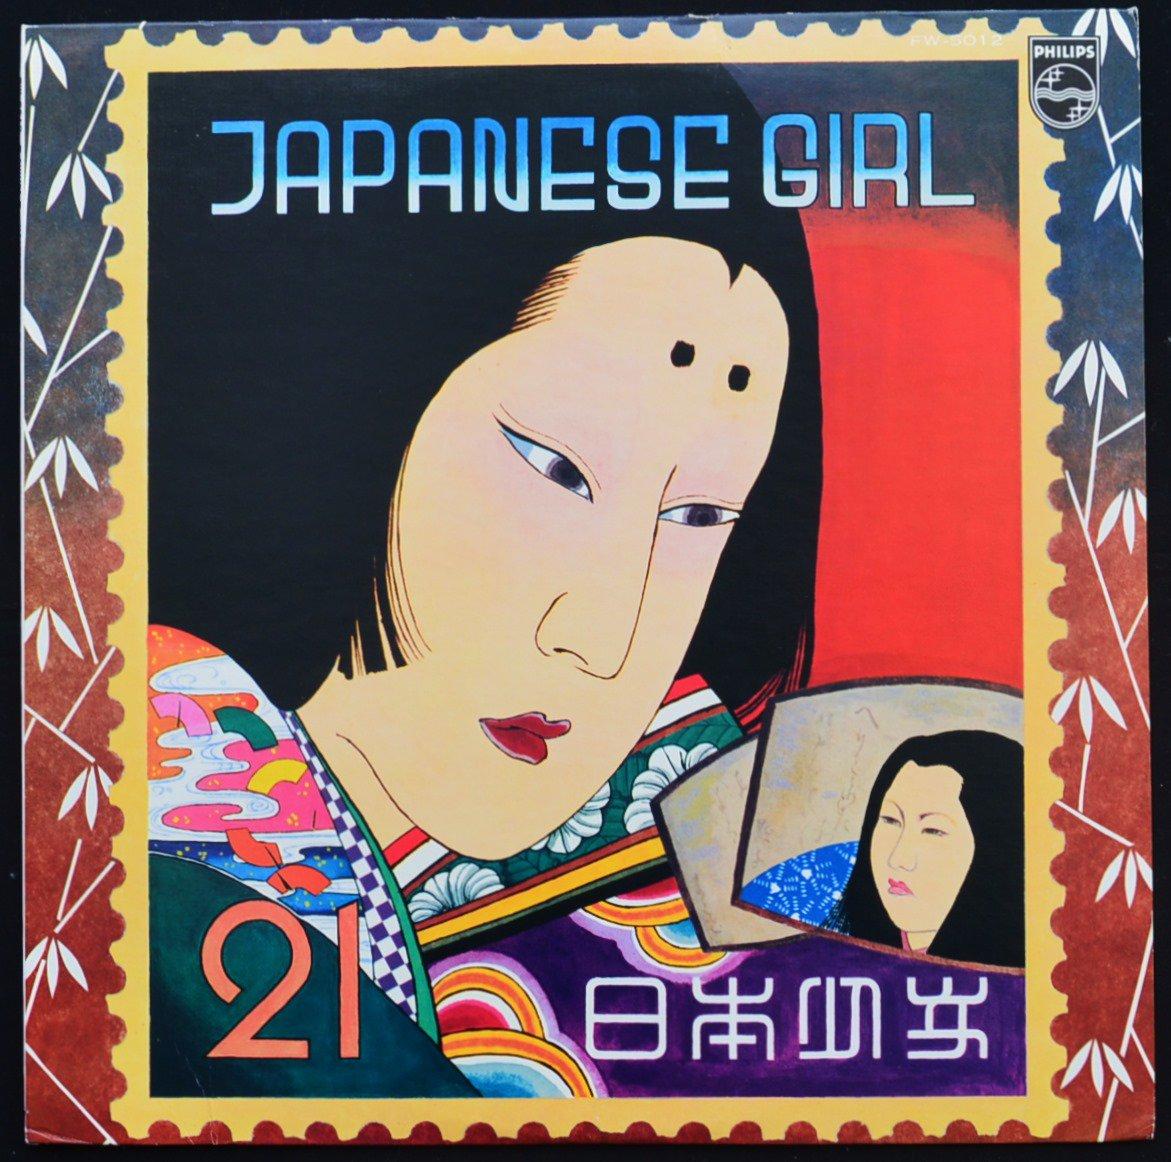 矢野顕子 AKIKO YANO / JAPANESE GIRL (日本少女) (LP)